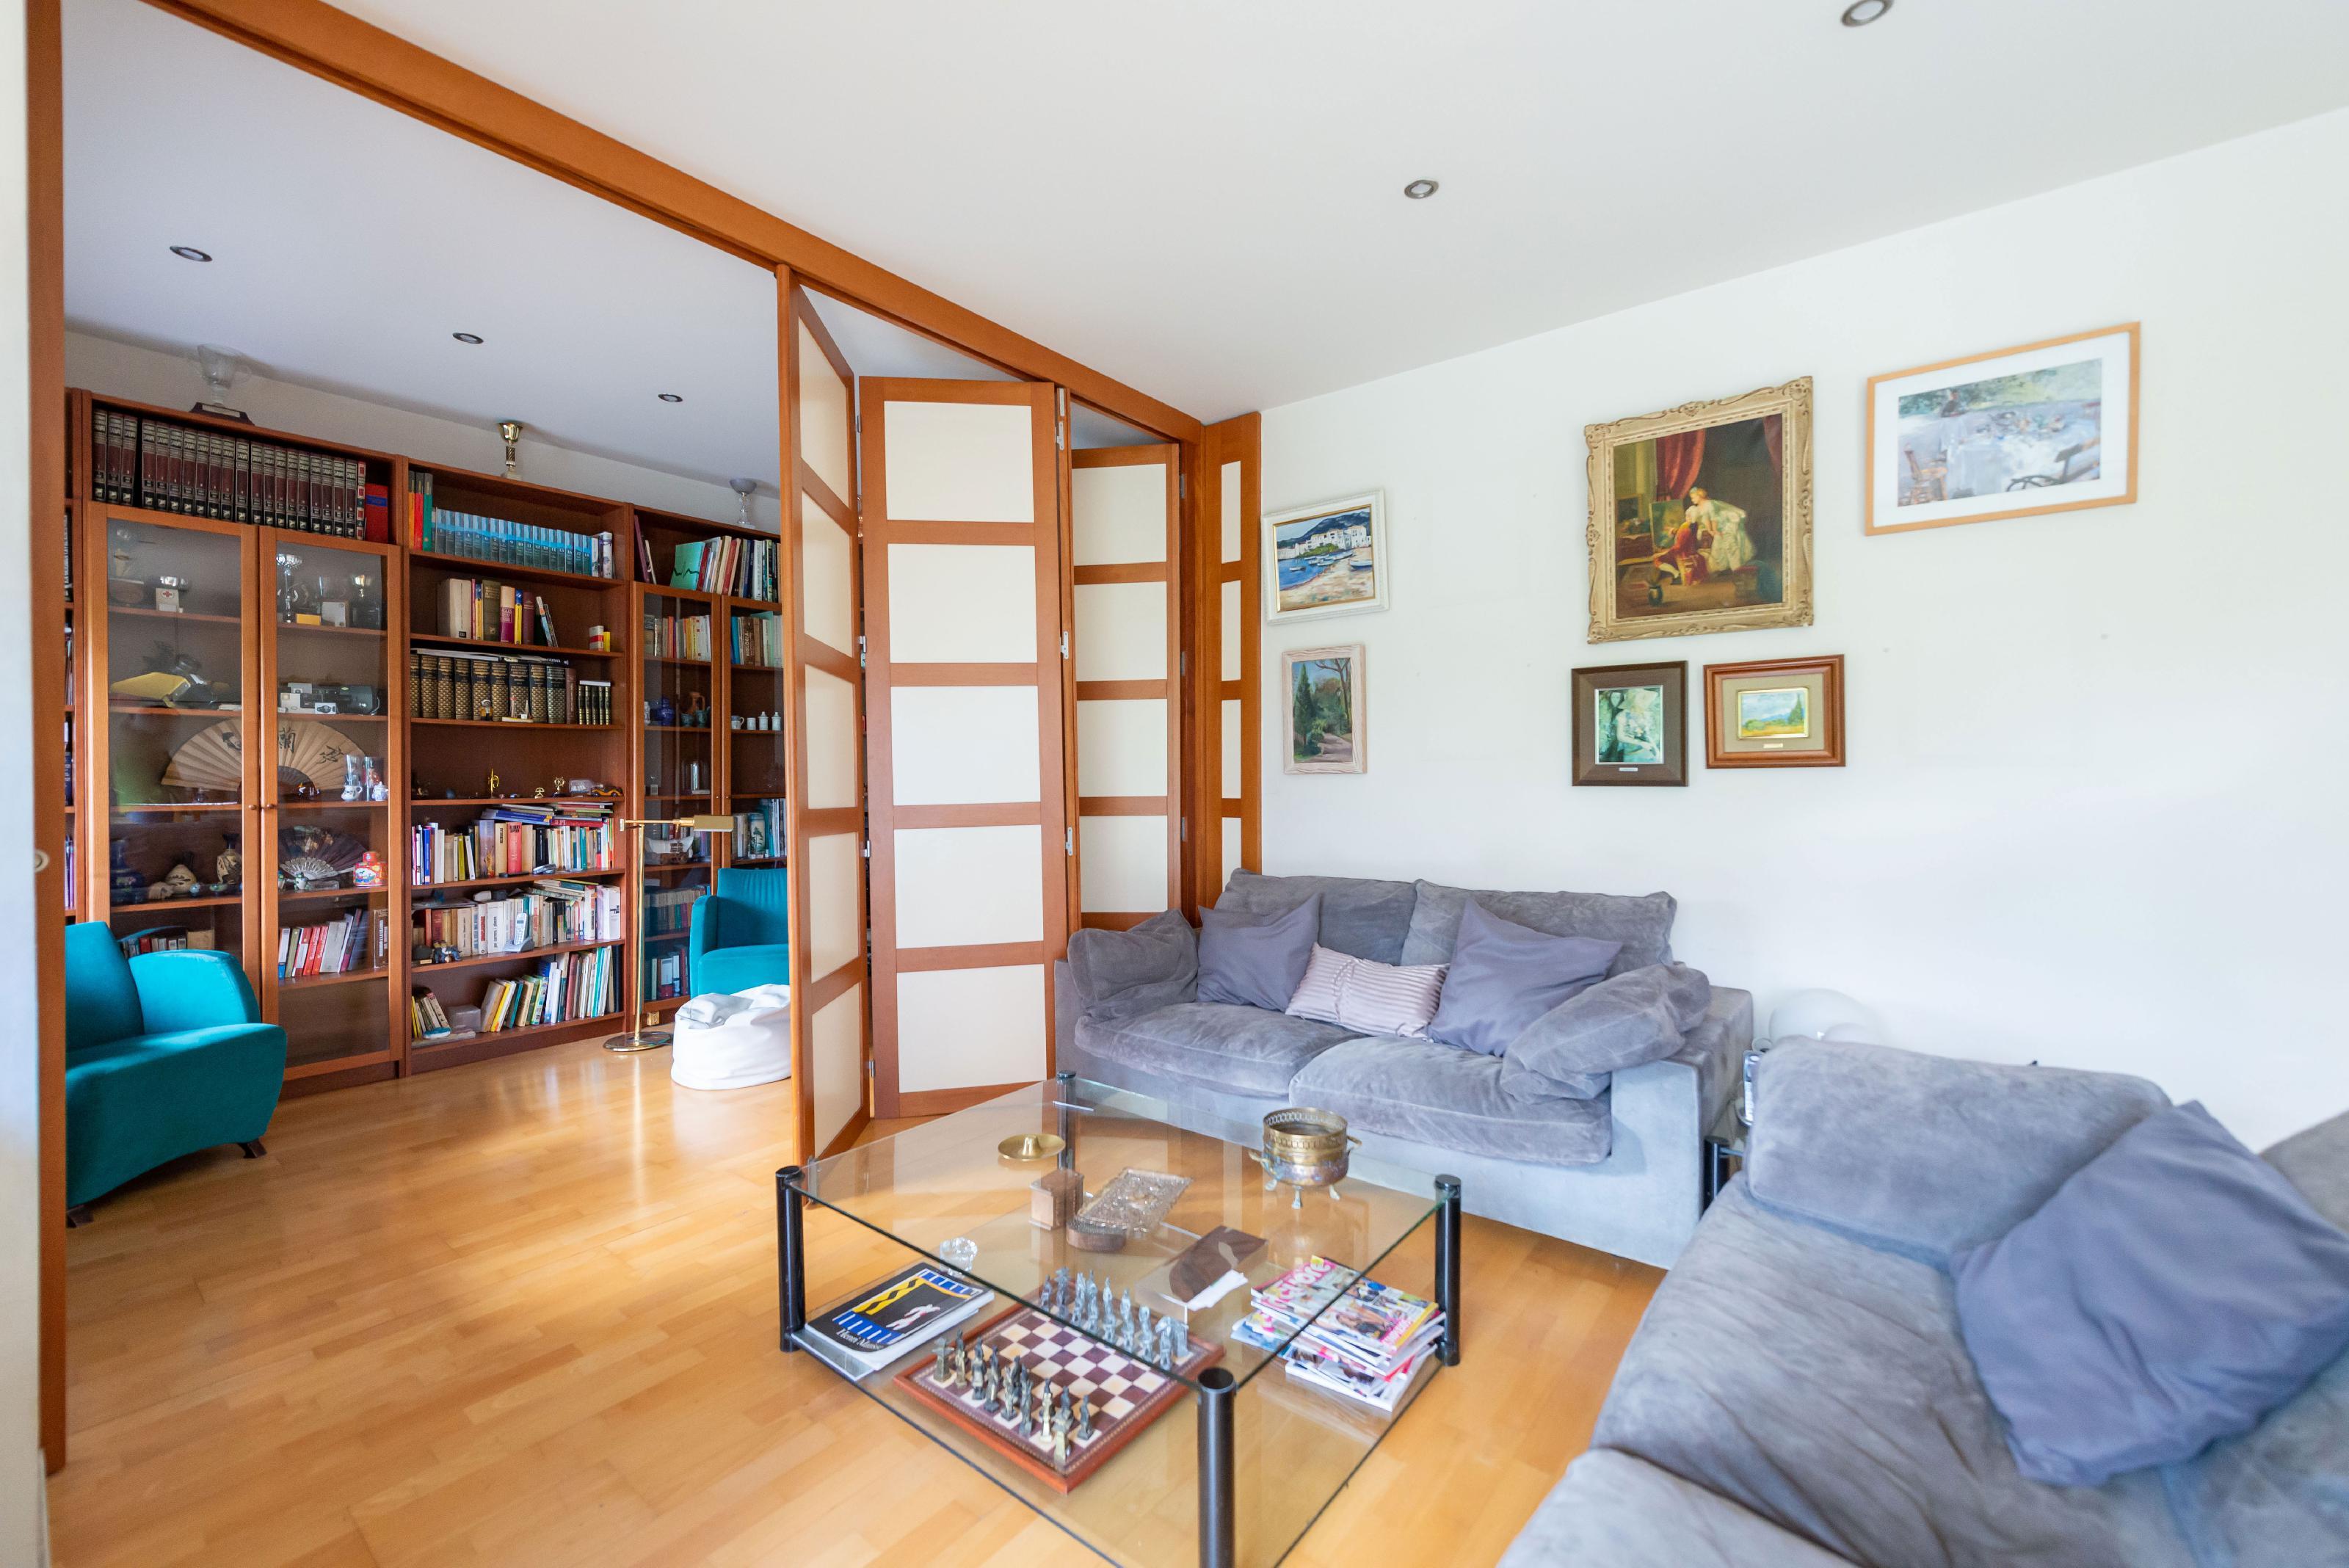 246281 Flat for sale in Sarrià-Sant Gervasi, Tres Torres 12